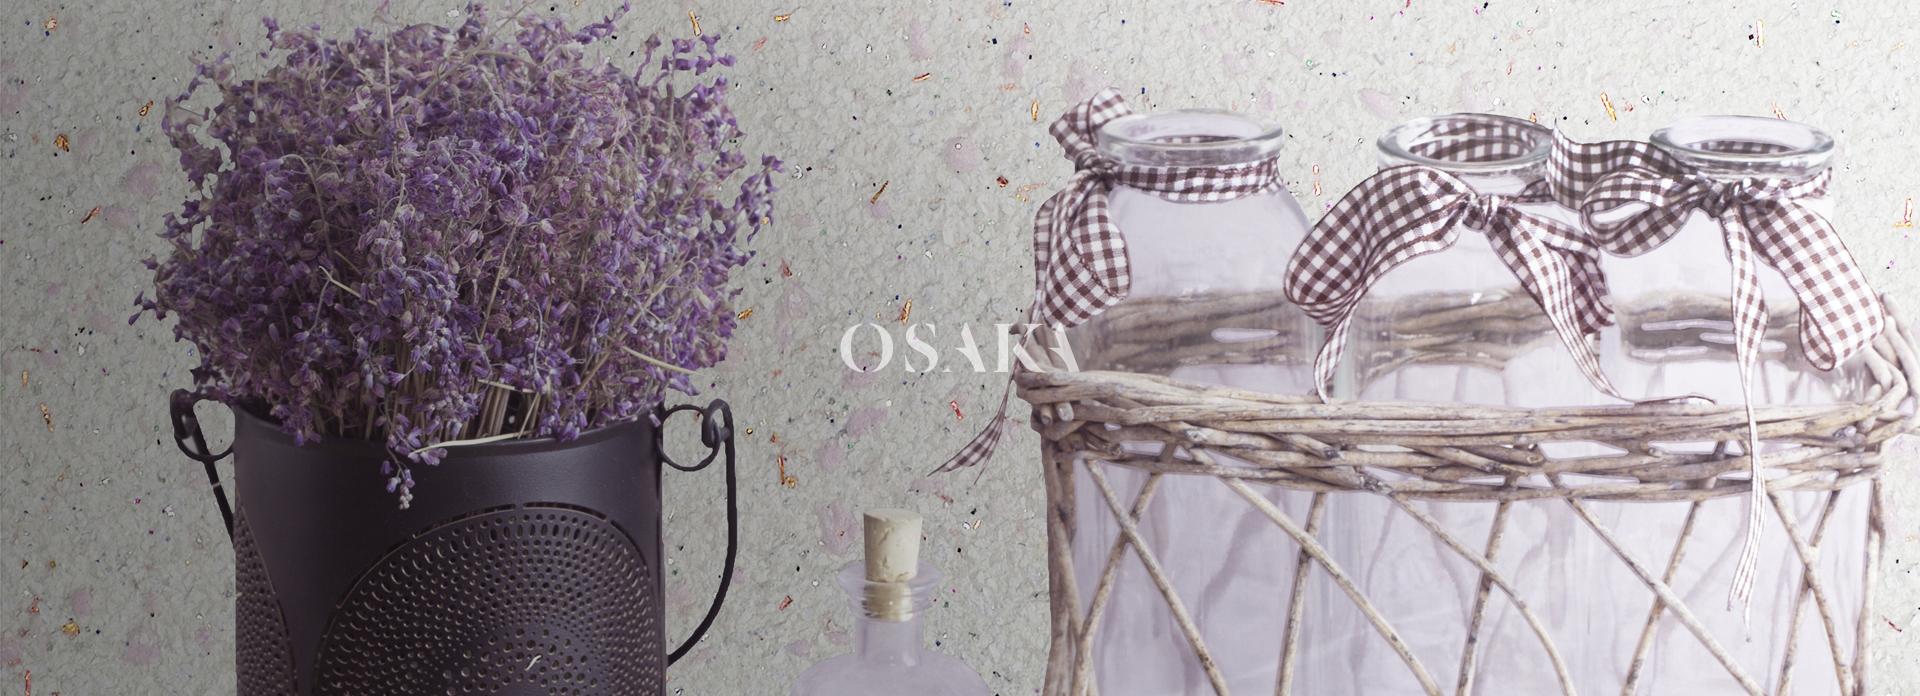 pintura-decorativaosaka-textil-japonés-6